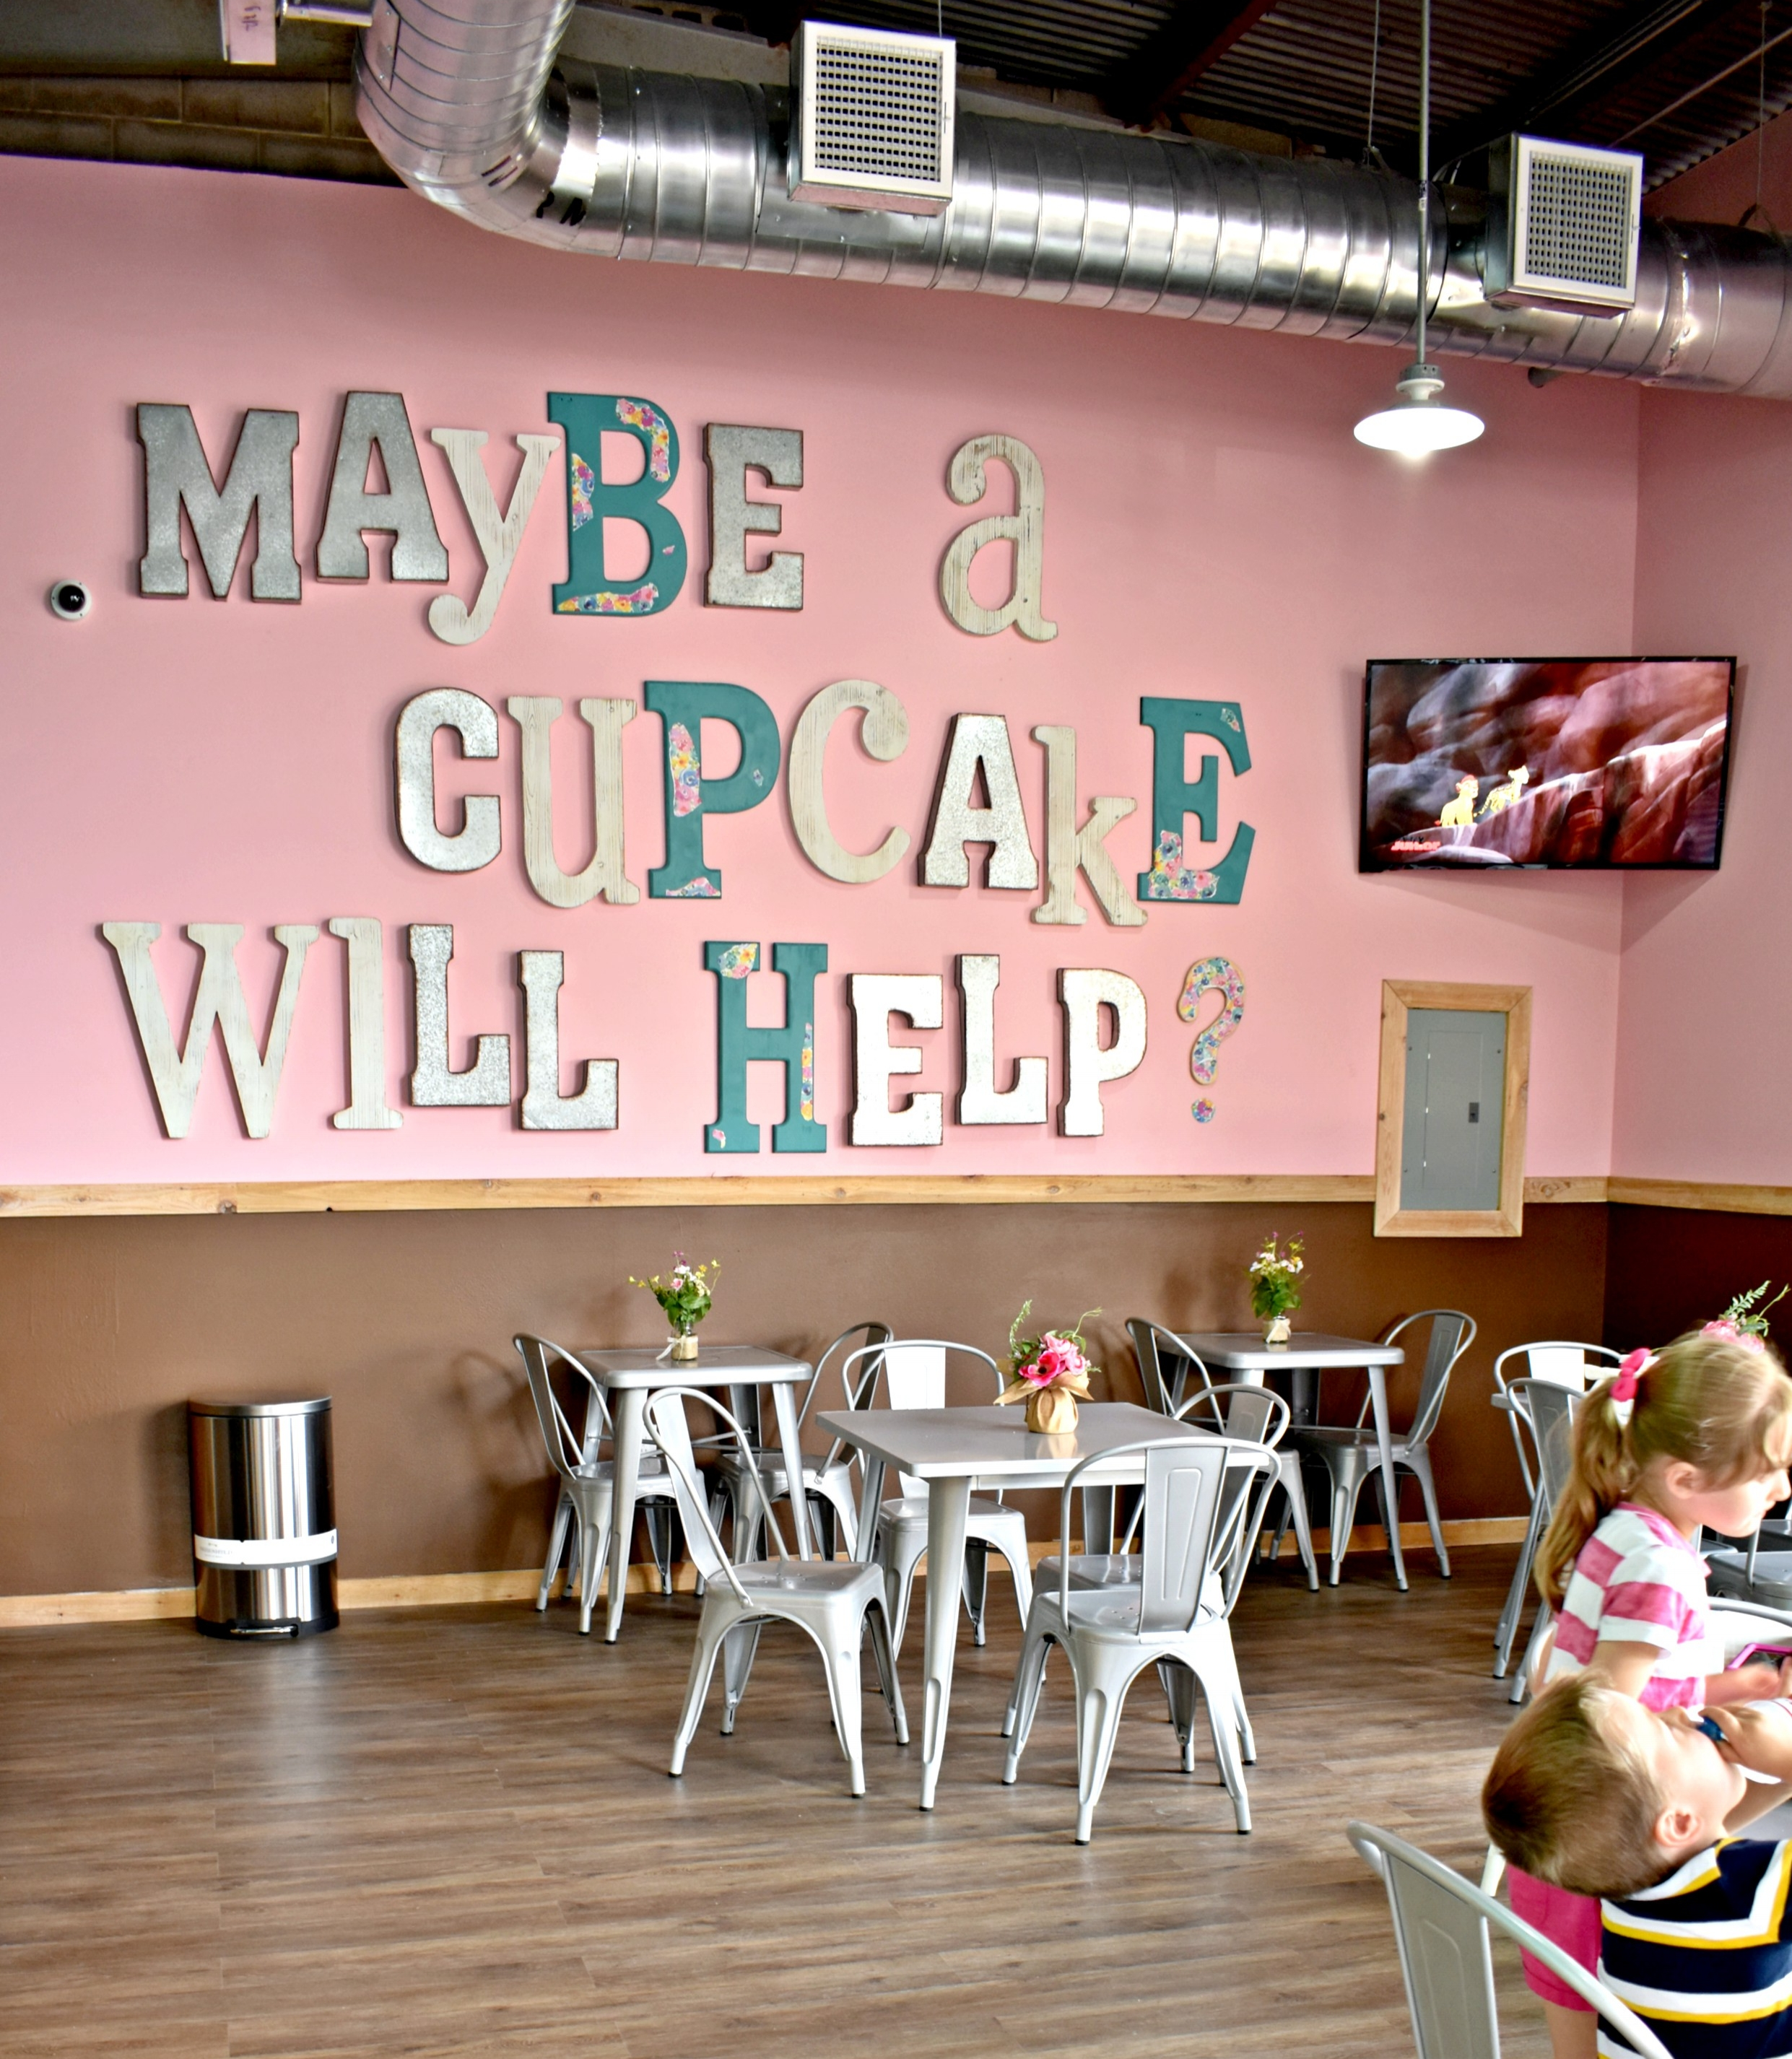 smallcakes cupcake and ice cream shop boerne texas